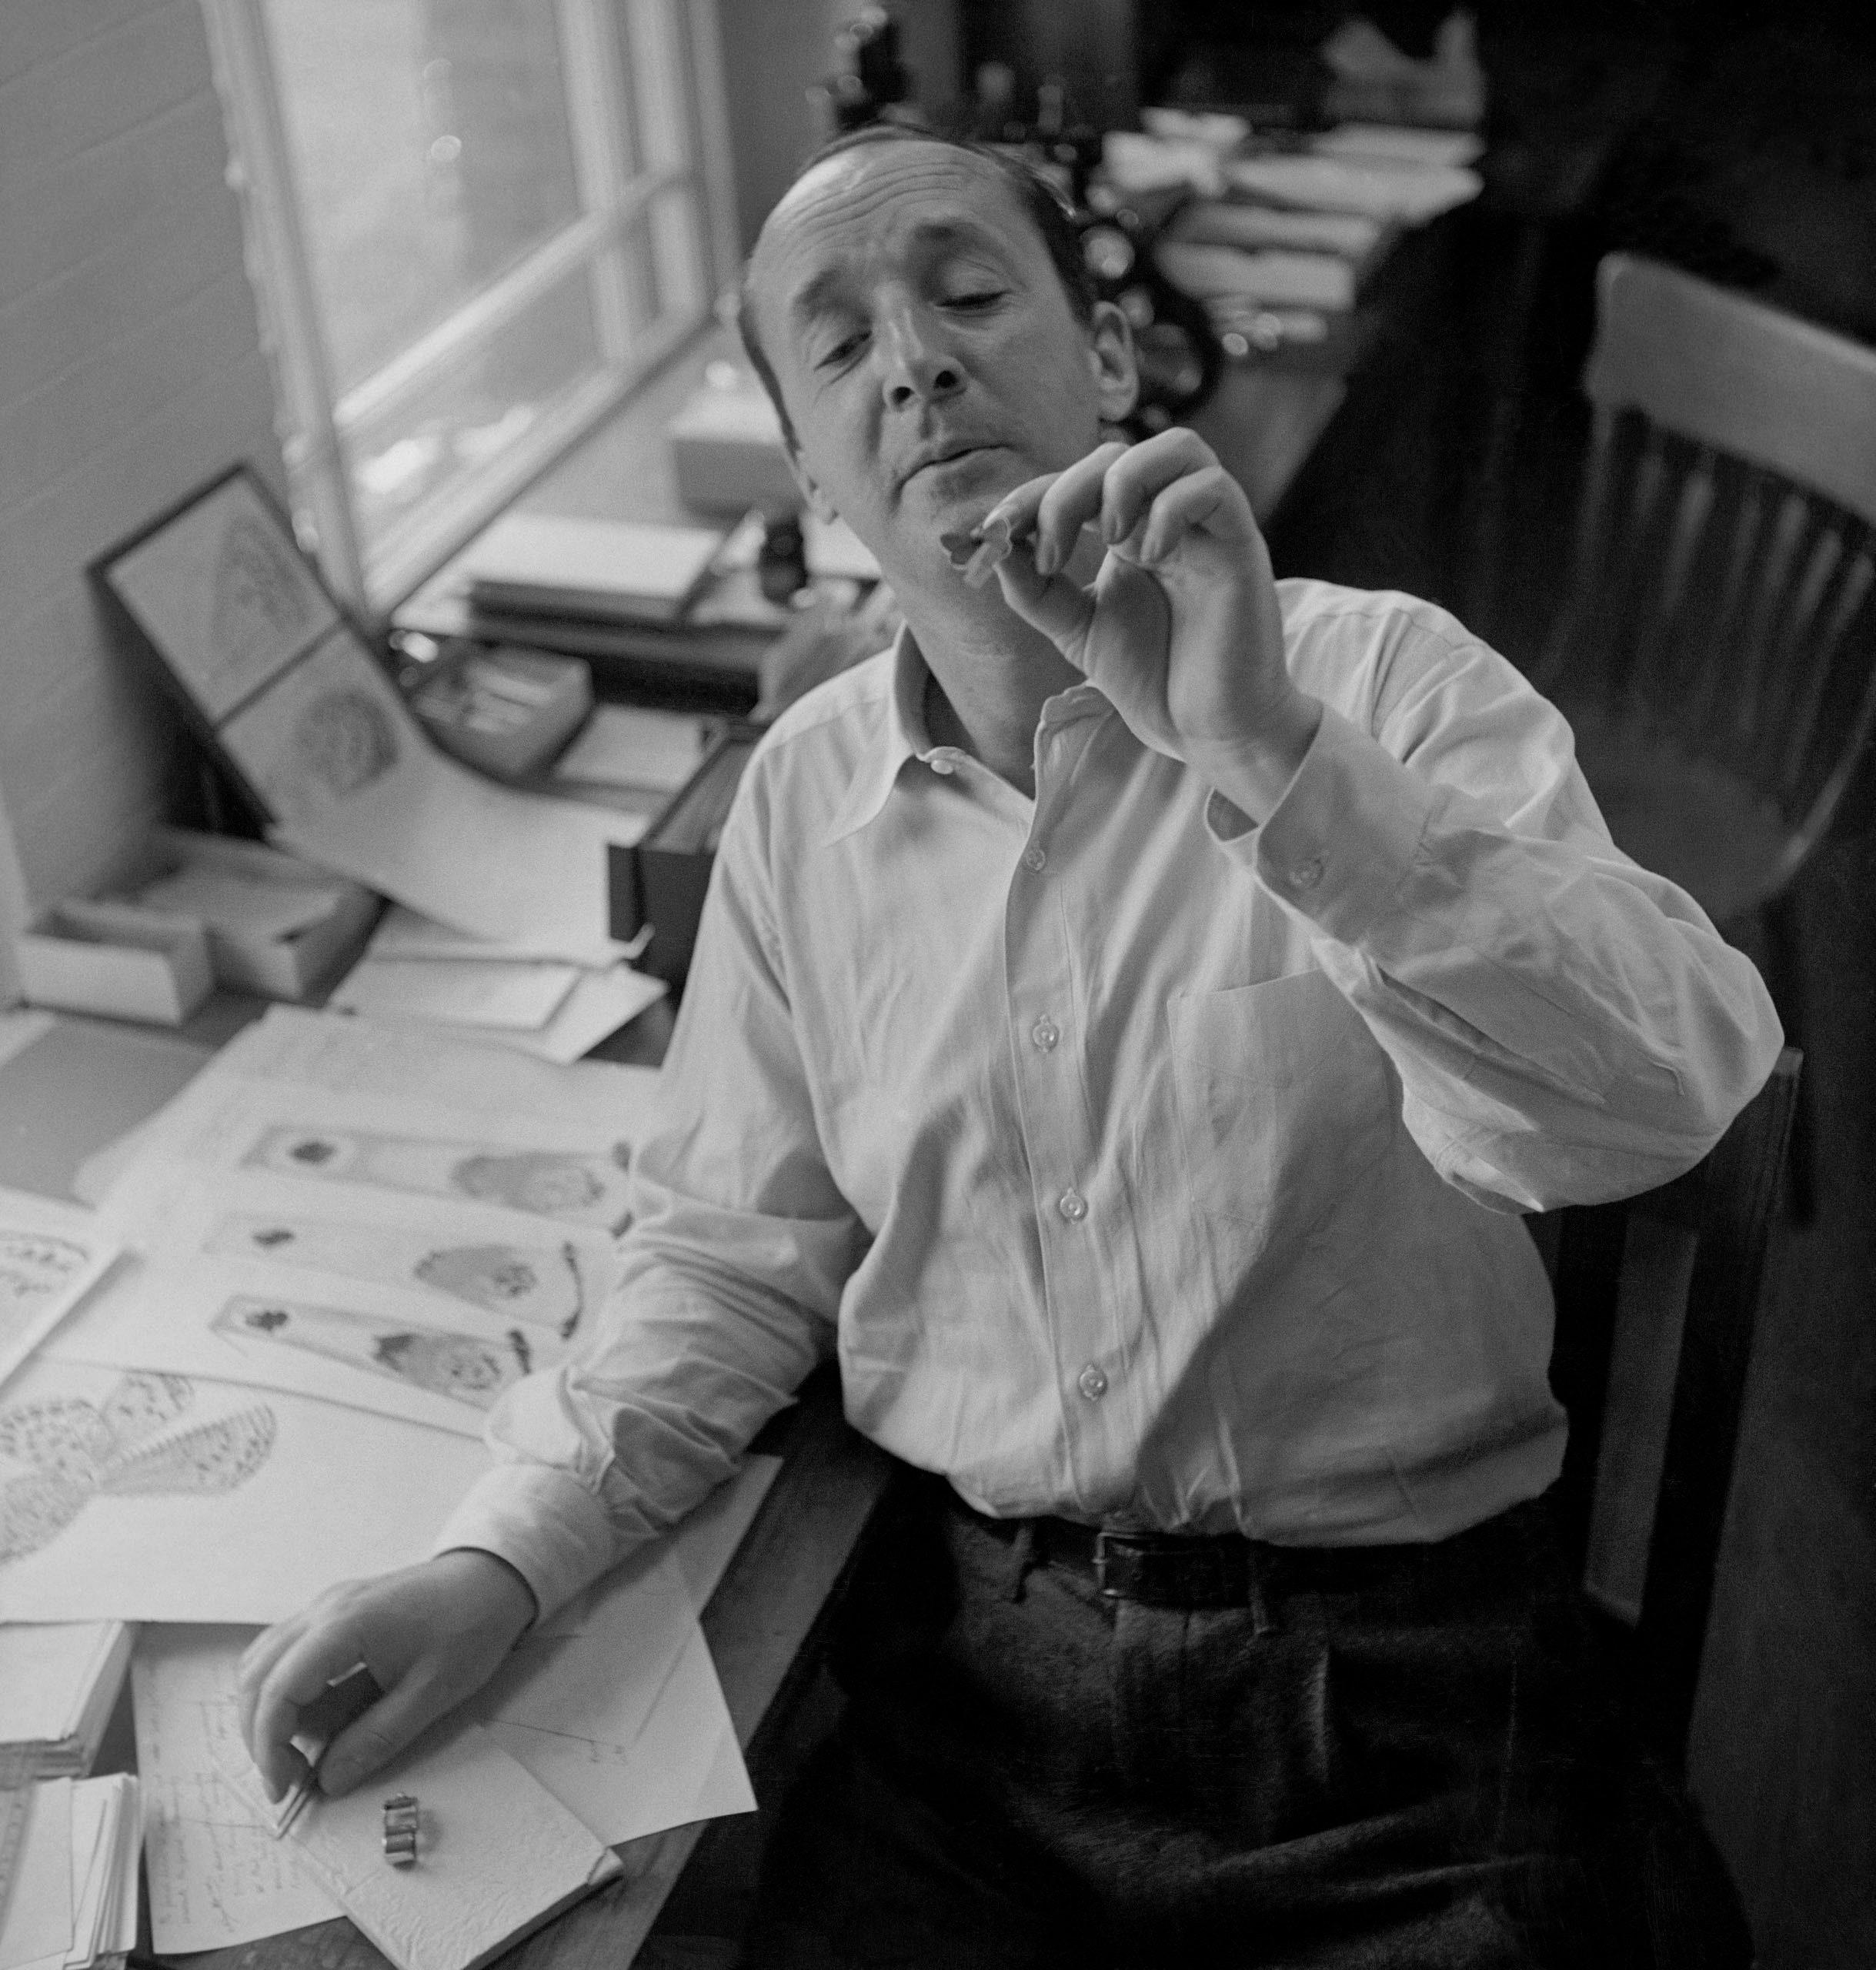 5038993e4d8f7b598793f8fc8288cfd9 3 - Vladimir Nabokov: The Russian Years